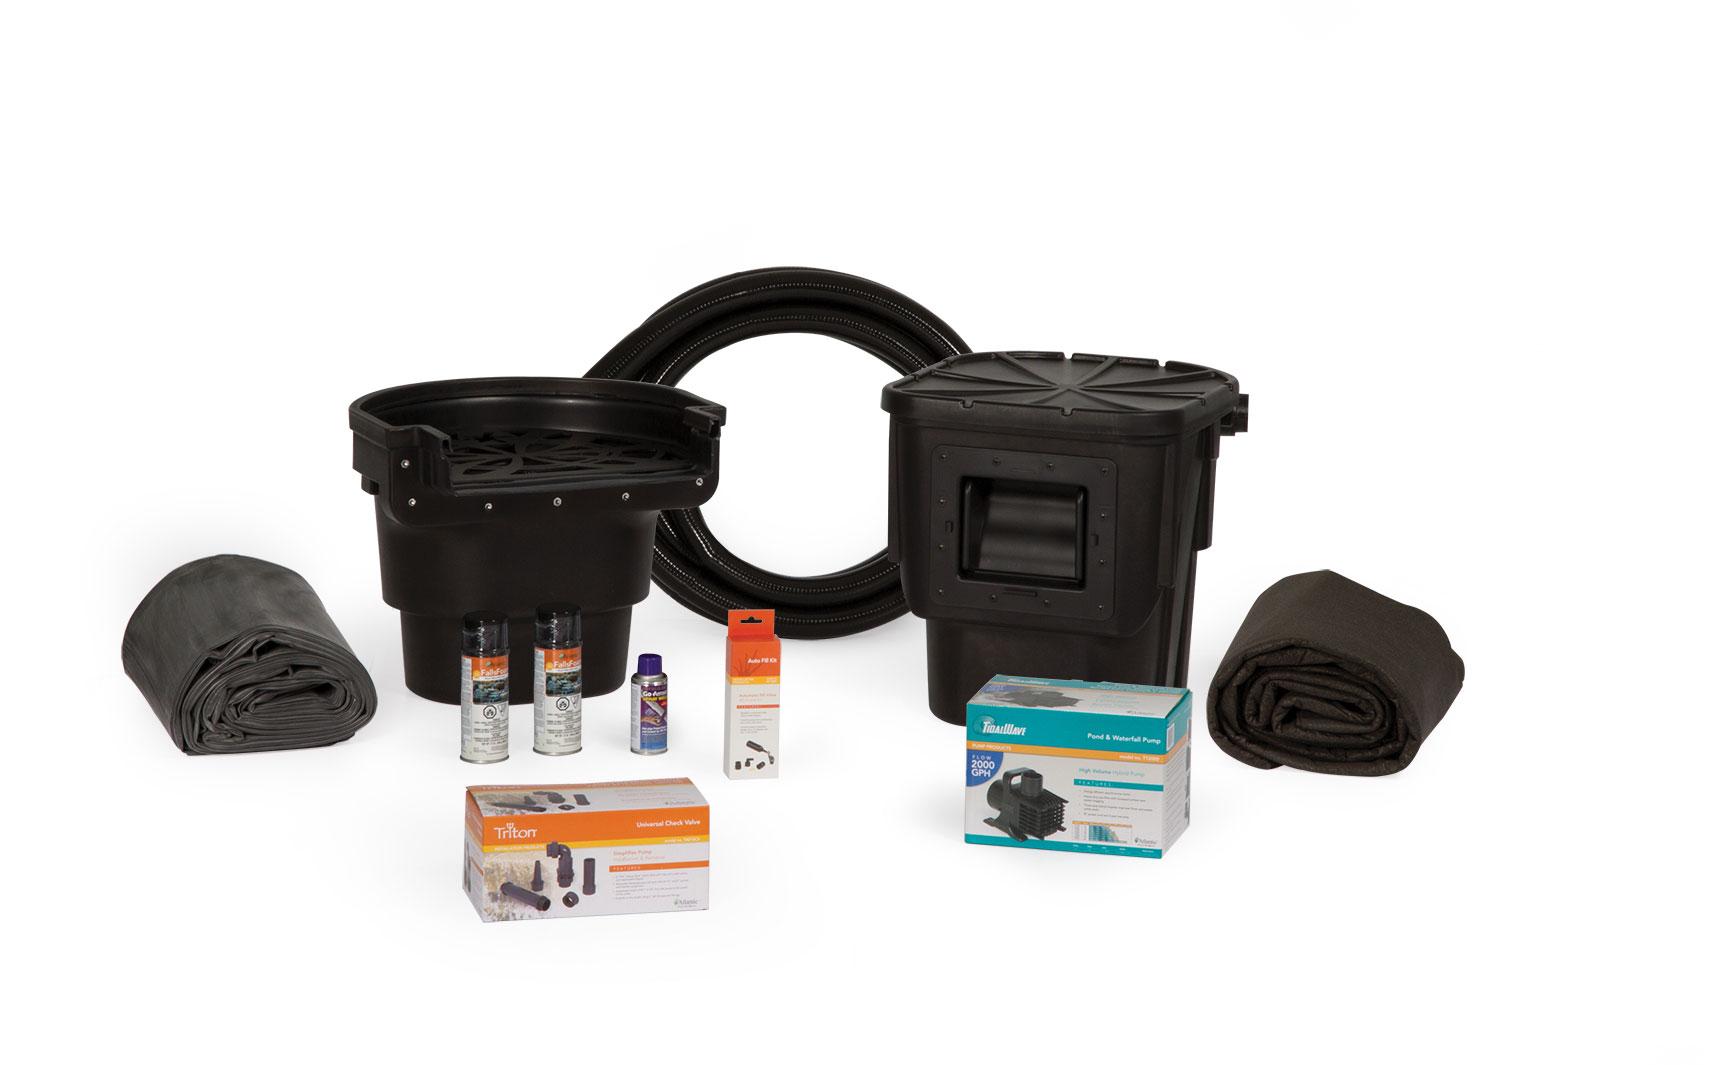 PK161015 - Small Pond Kit